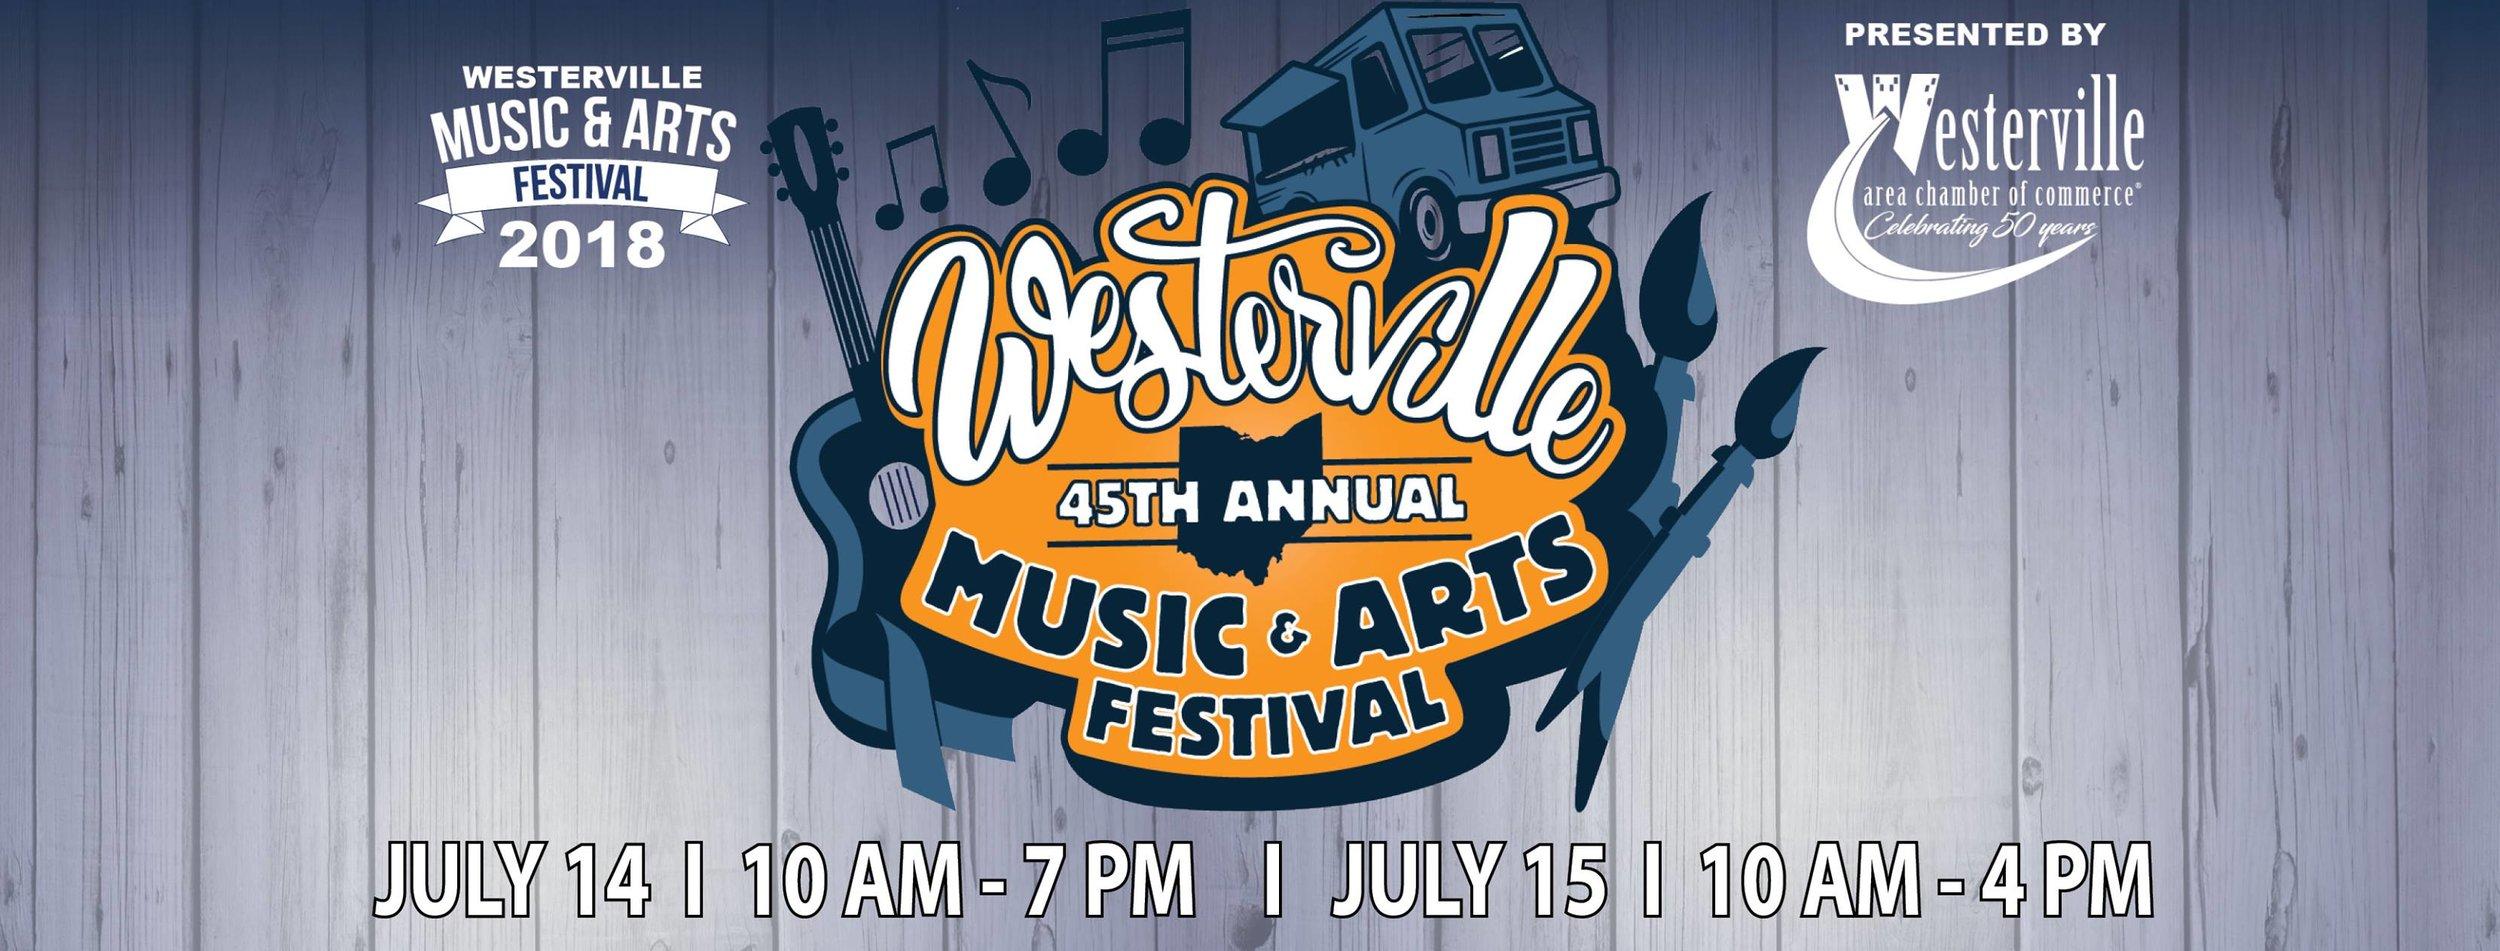 Westerville Music & Arts Festival